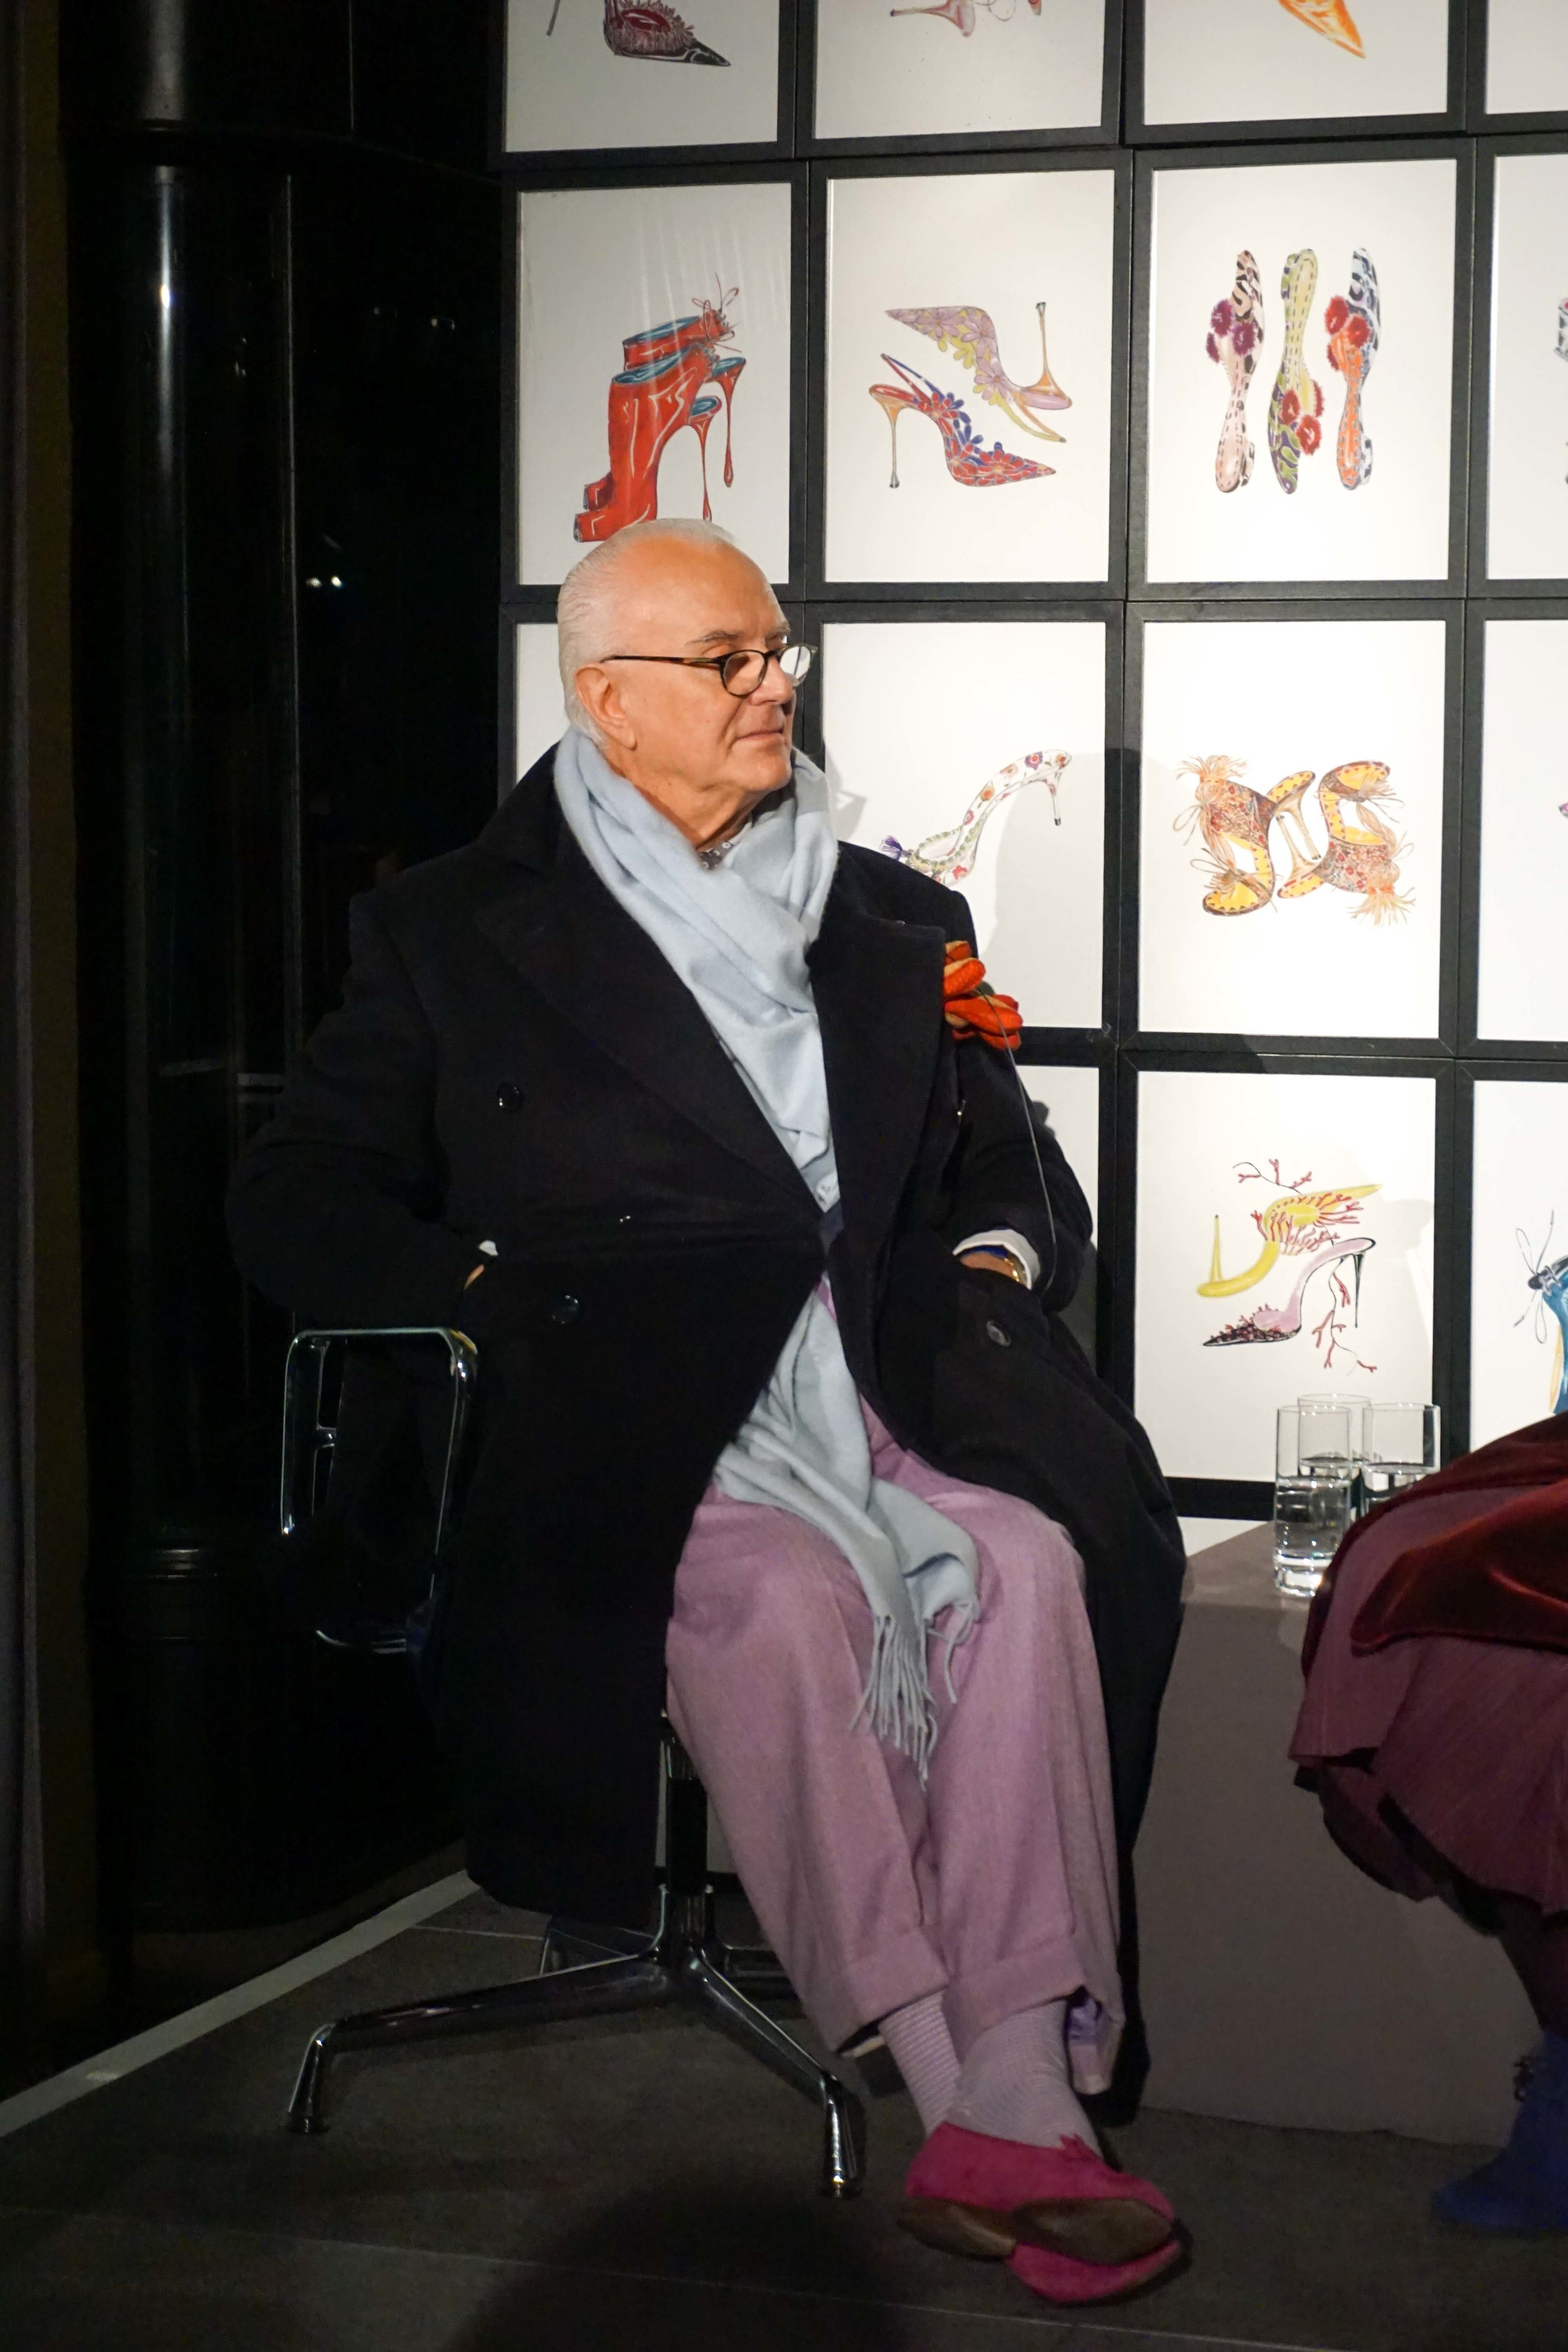 Manolo Blahnik speaking at Burlington Arcade, Mayfair.